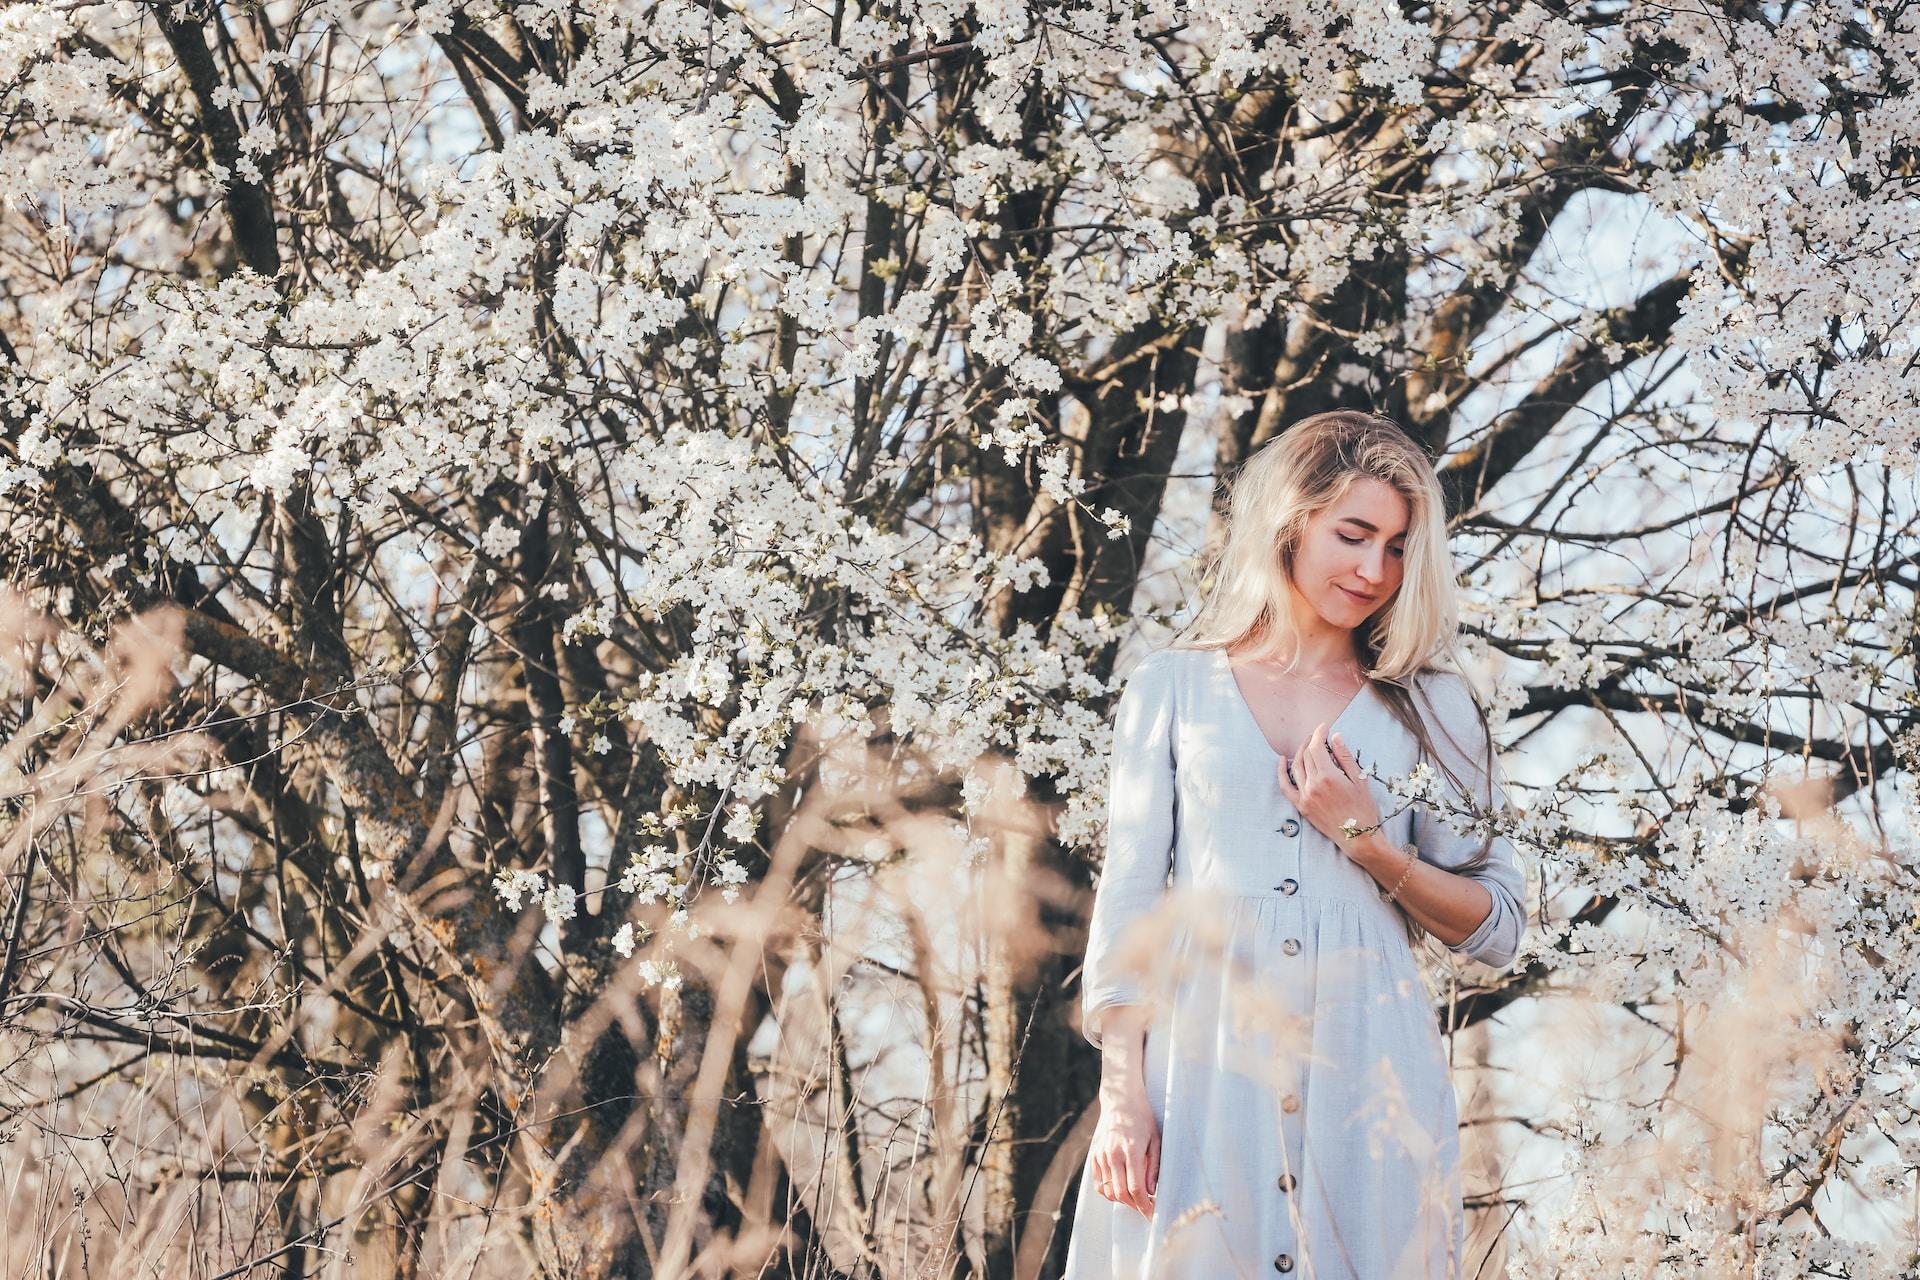 woman in white sleeveless dress standing under white cherry blossom tree during daytime